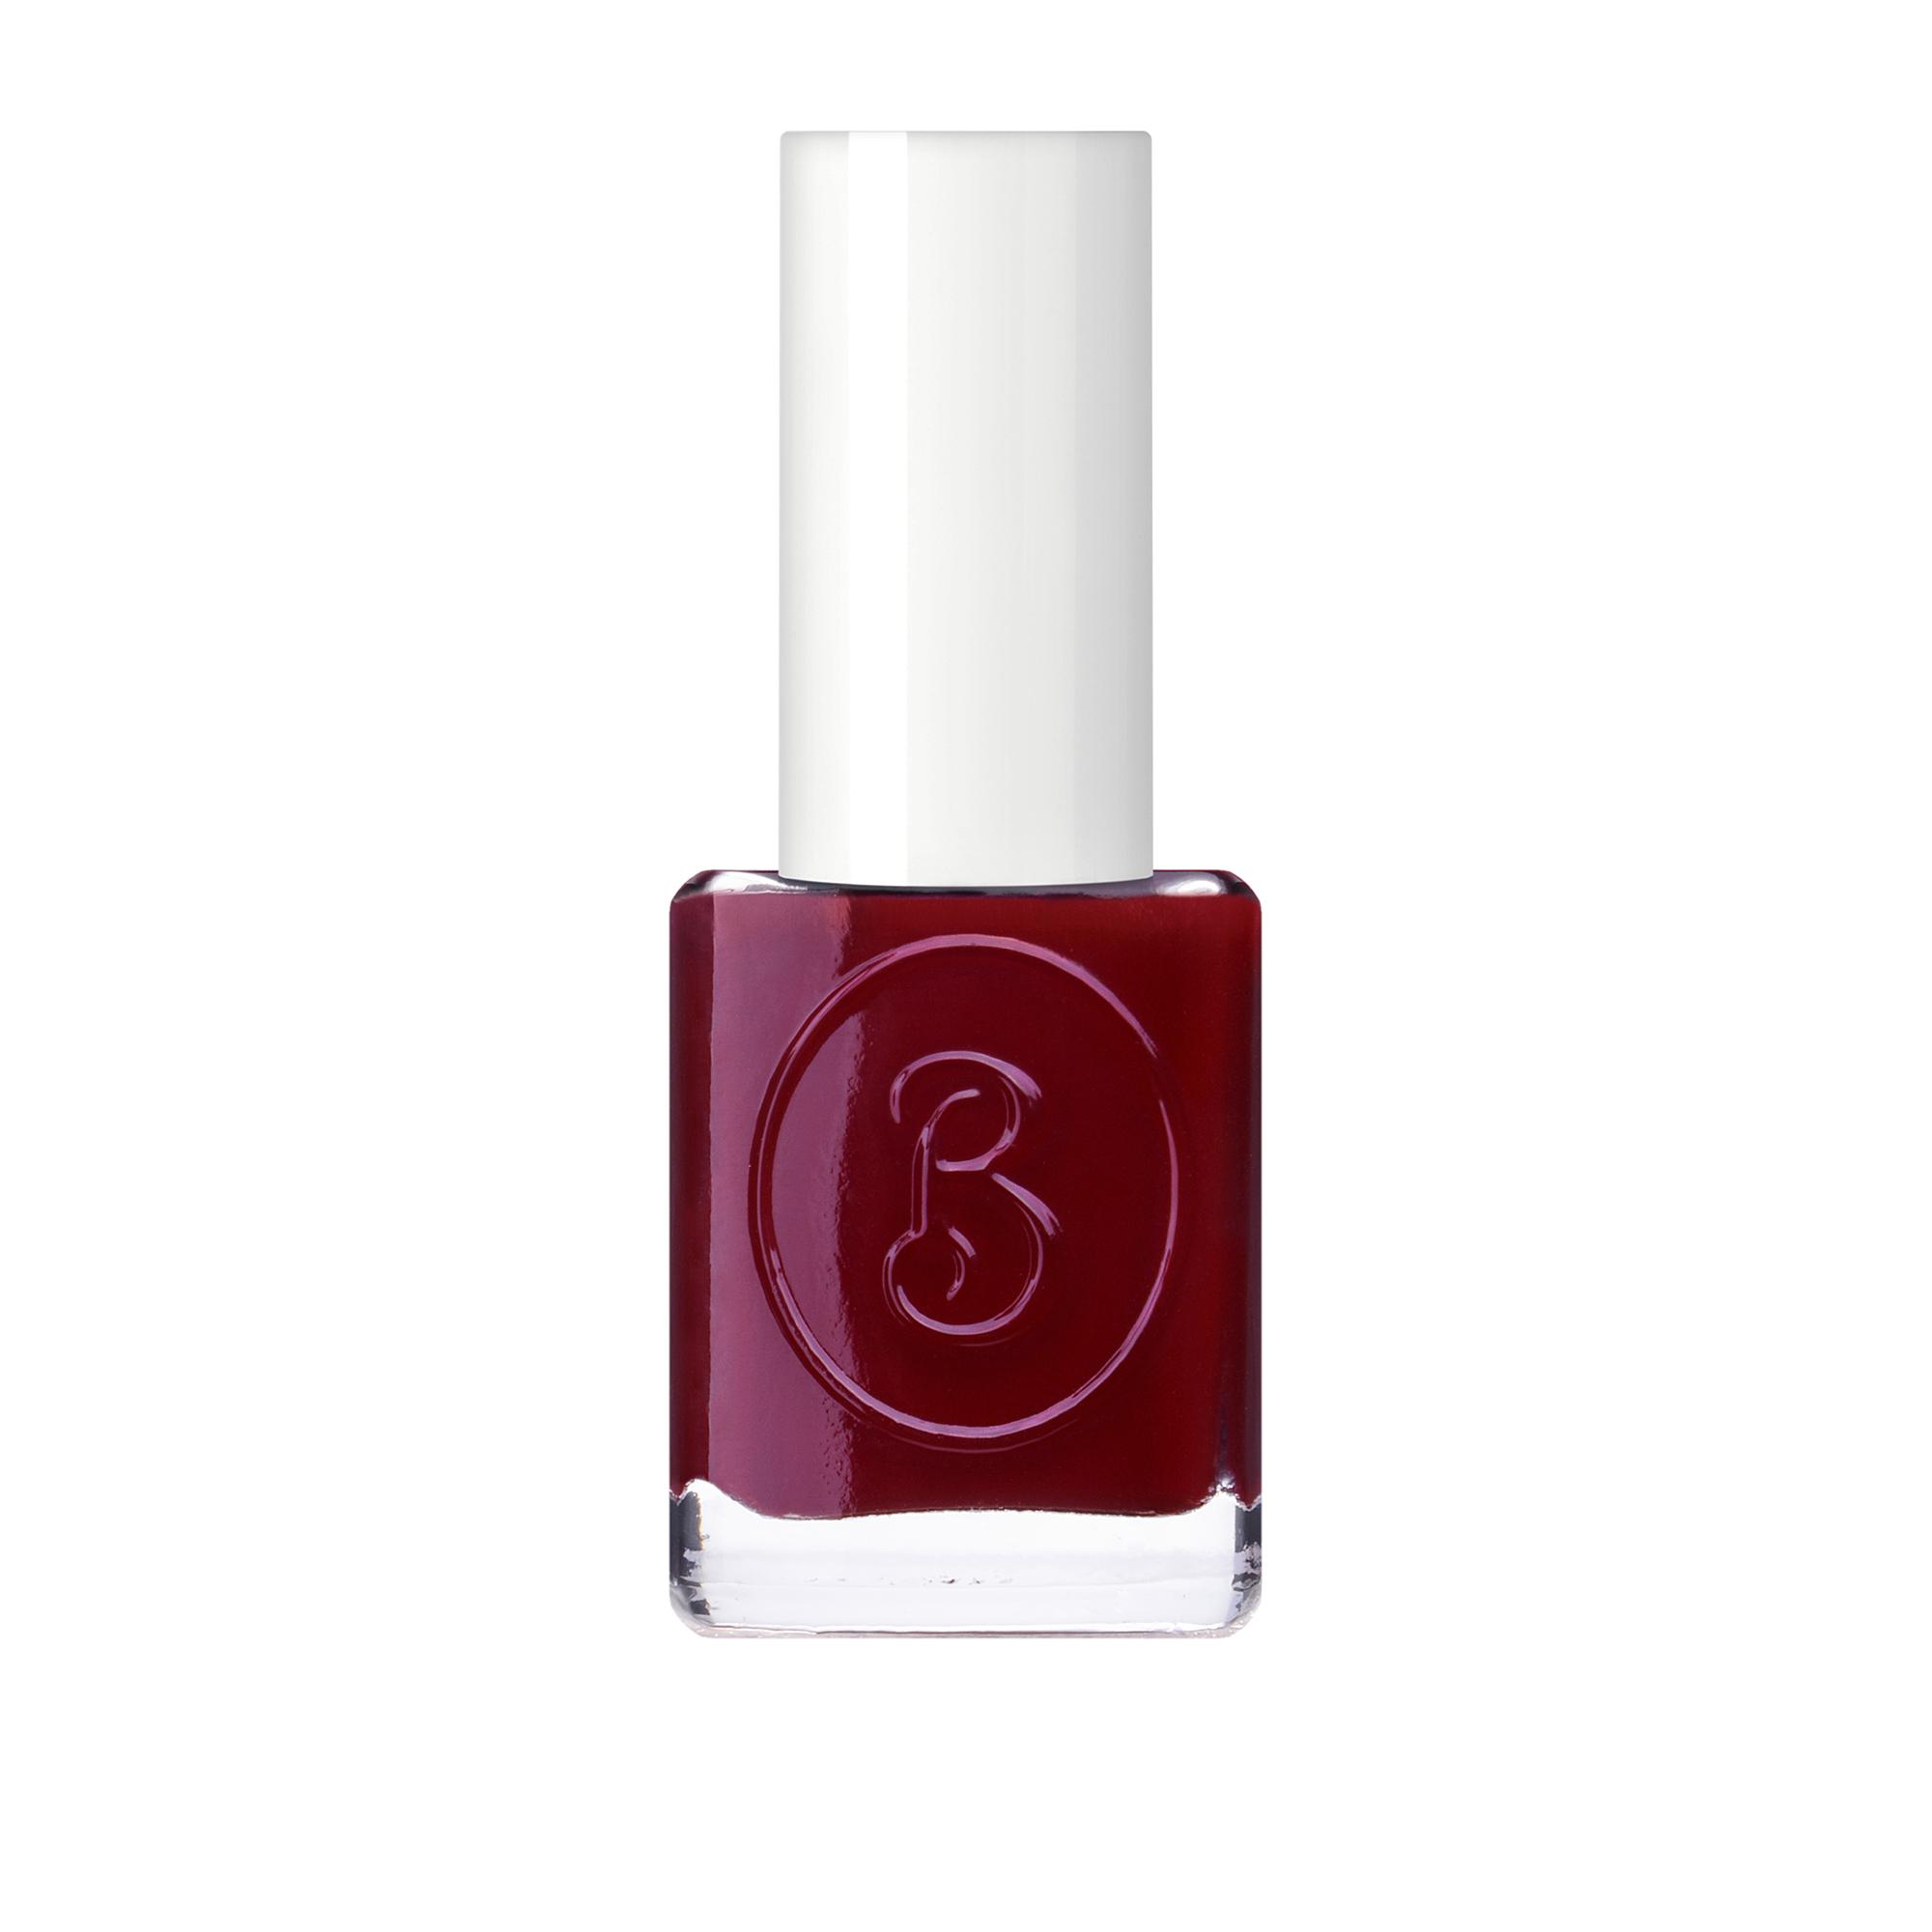 BERENICE 09 лак для ногтей, темно красный / Dark red 16 мл berenice 53 лак для ногтей рыжая лиса red fox 16 мл